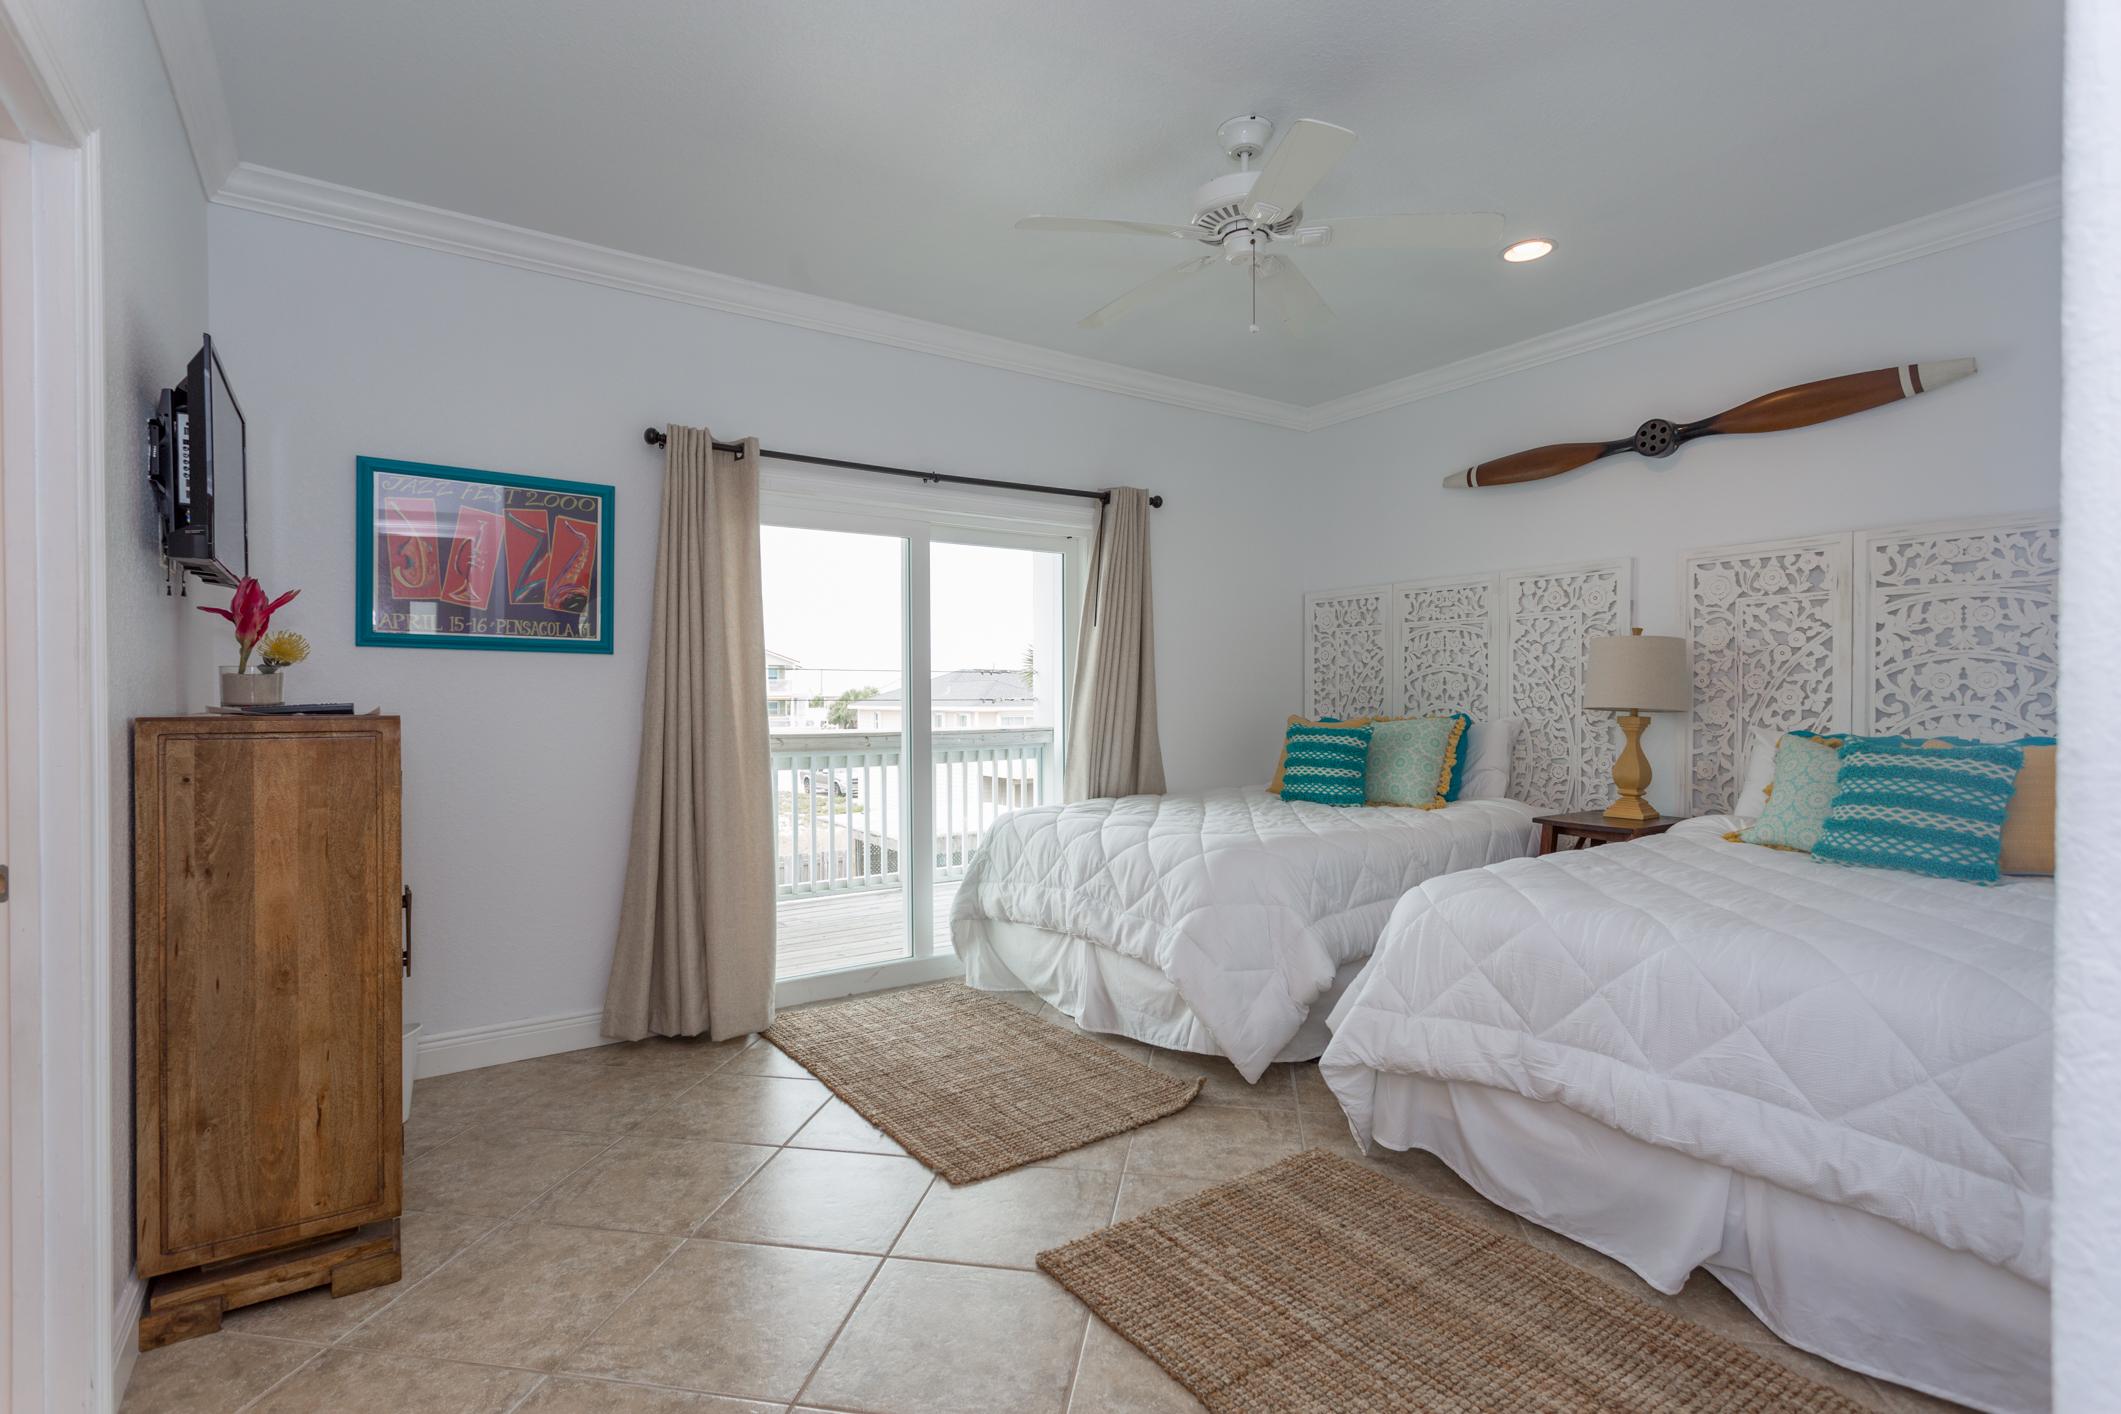 Ariola 1003 - The Starfish House House/Cottage rental in Pensacola Beach House Rentals in Pensacola Beach Florida - #40